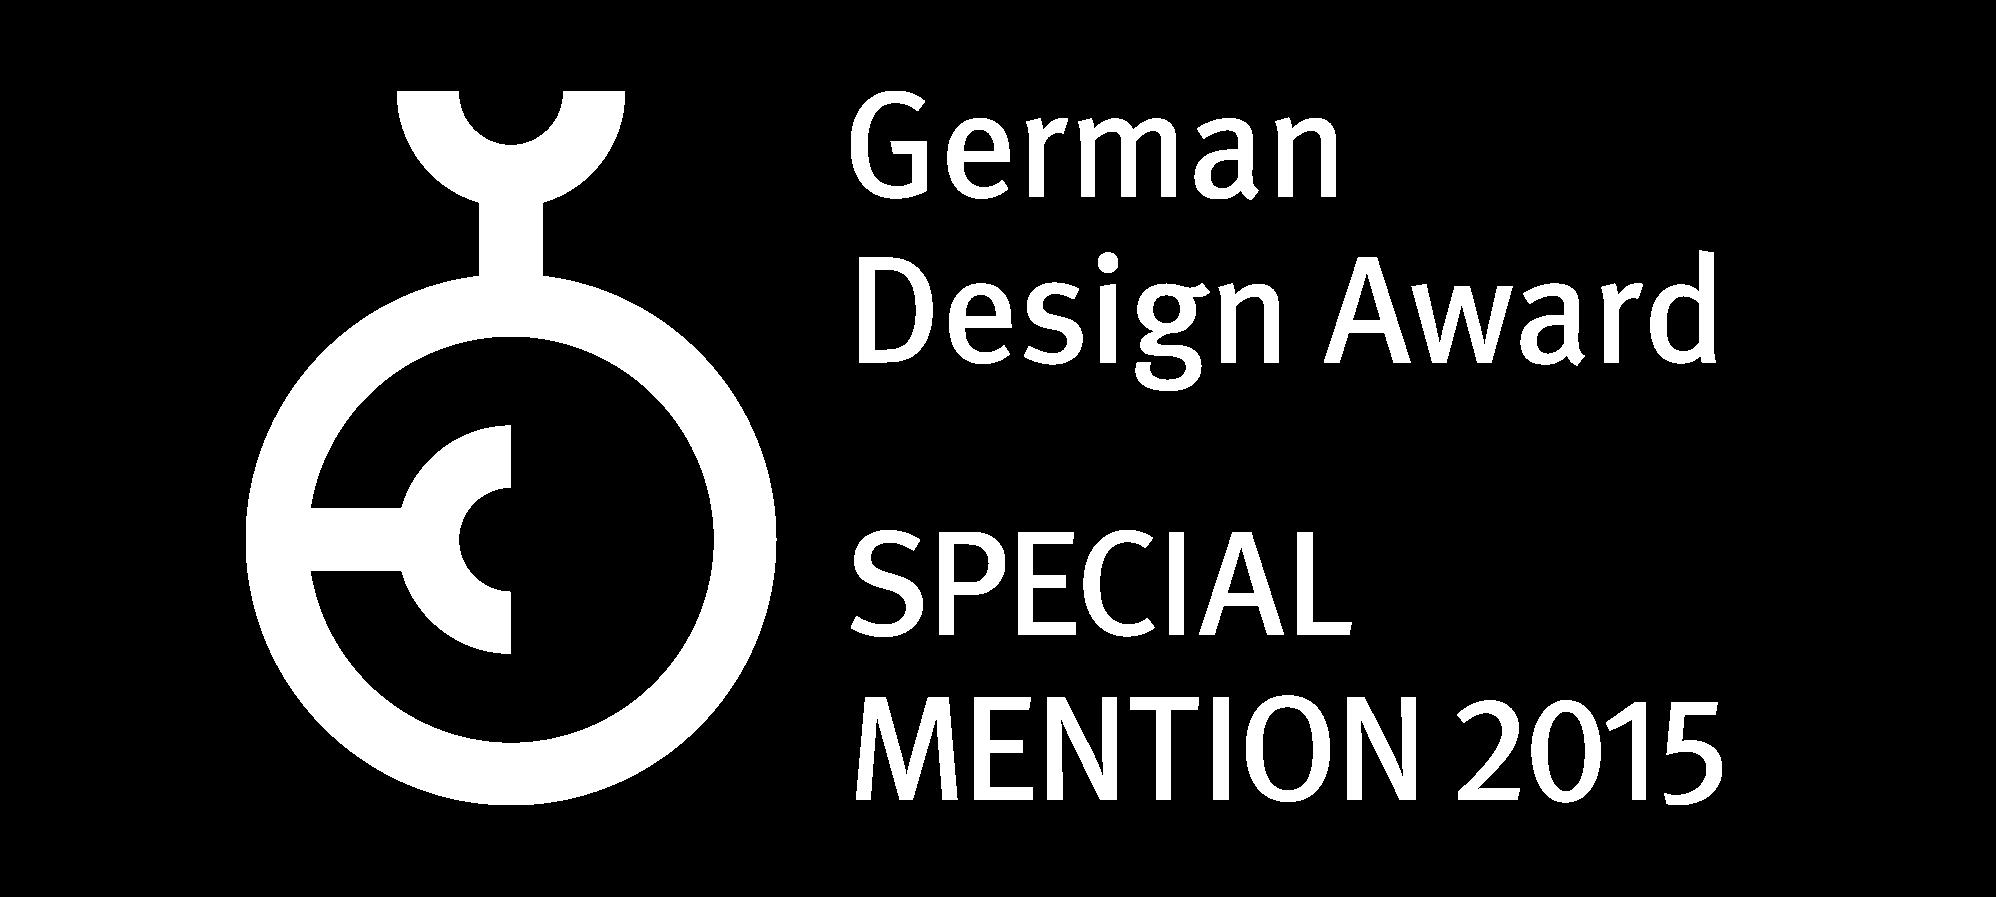 German_Design_Award_Special_Mention_2015_white